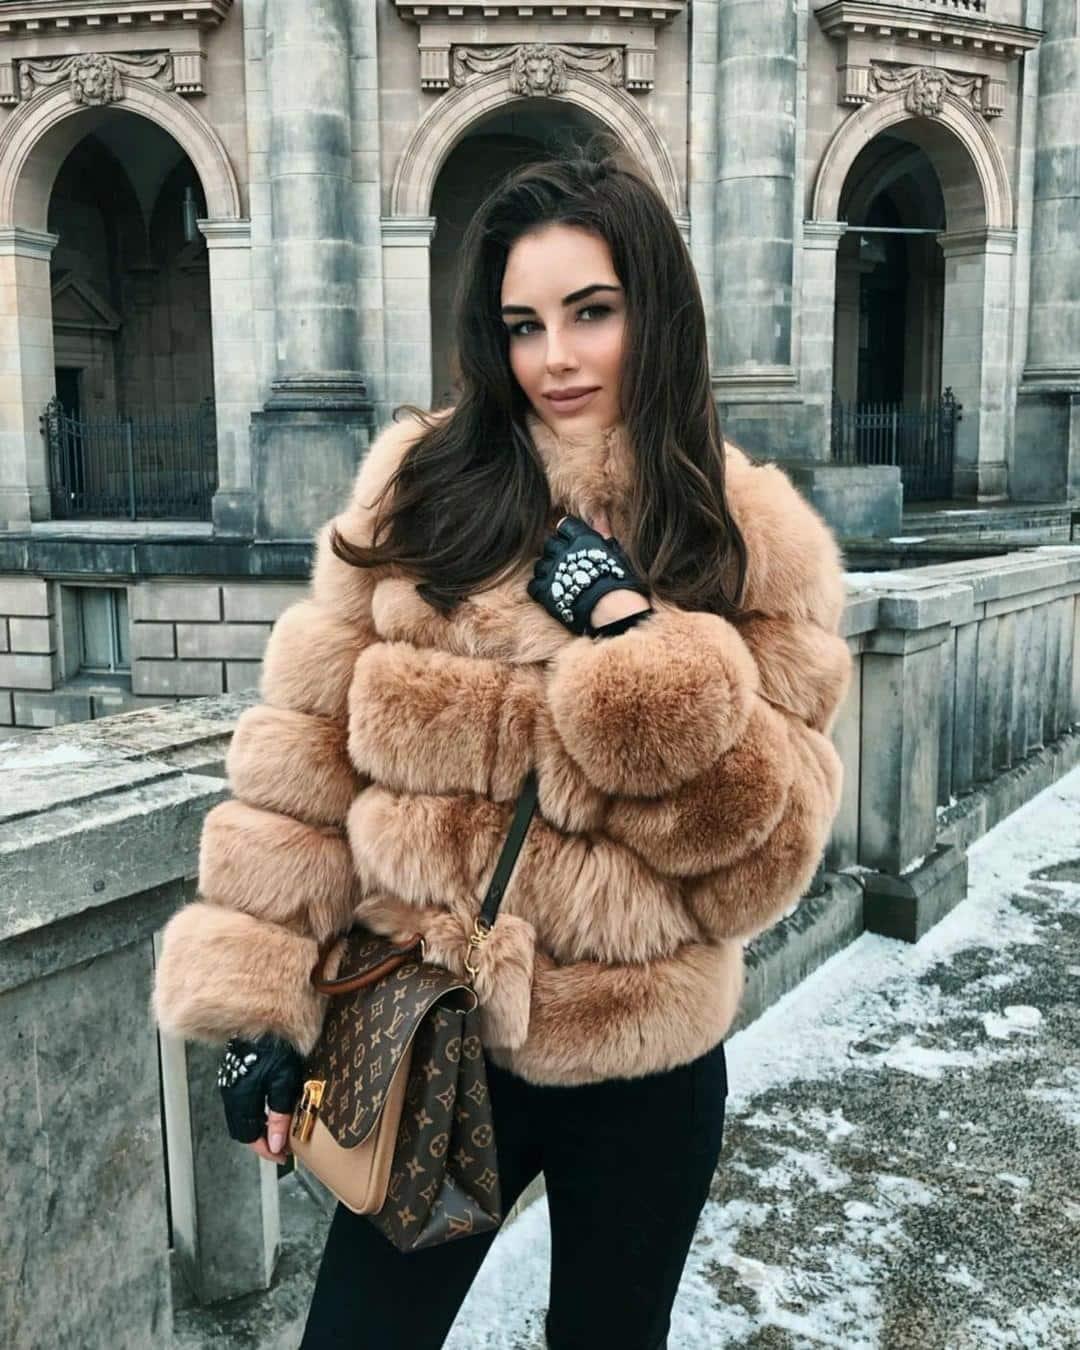 carla-camel-veronika_klimovits-3